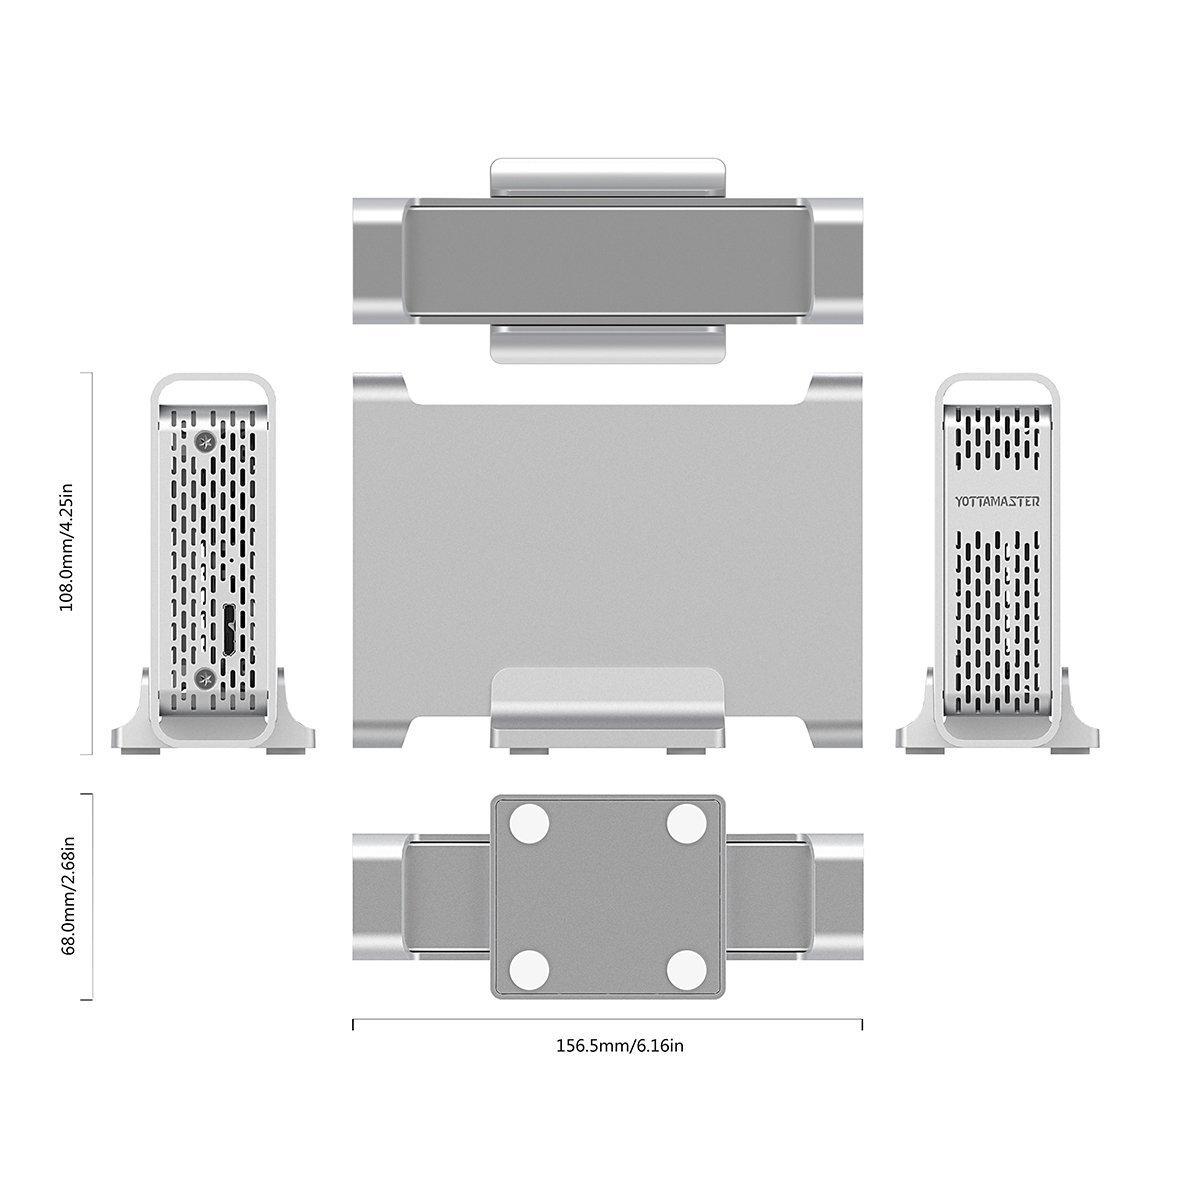 Amazon.com: yottamaster Type-C Hard Drive Enclosure de 2,5 ...